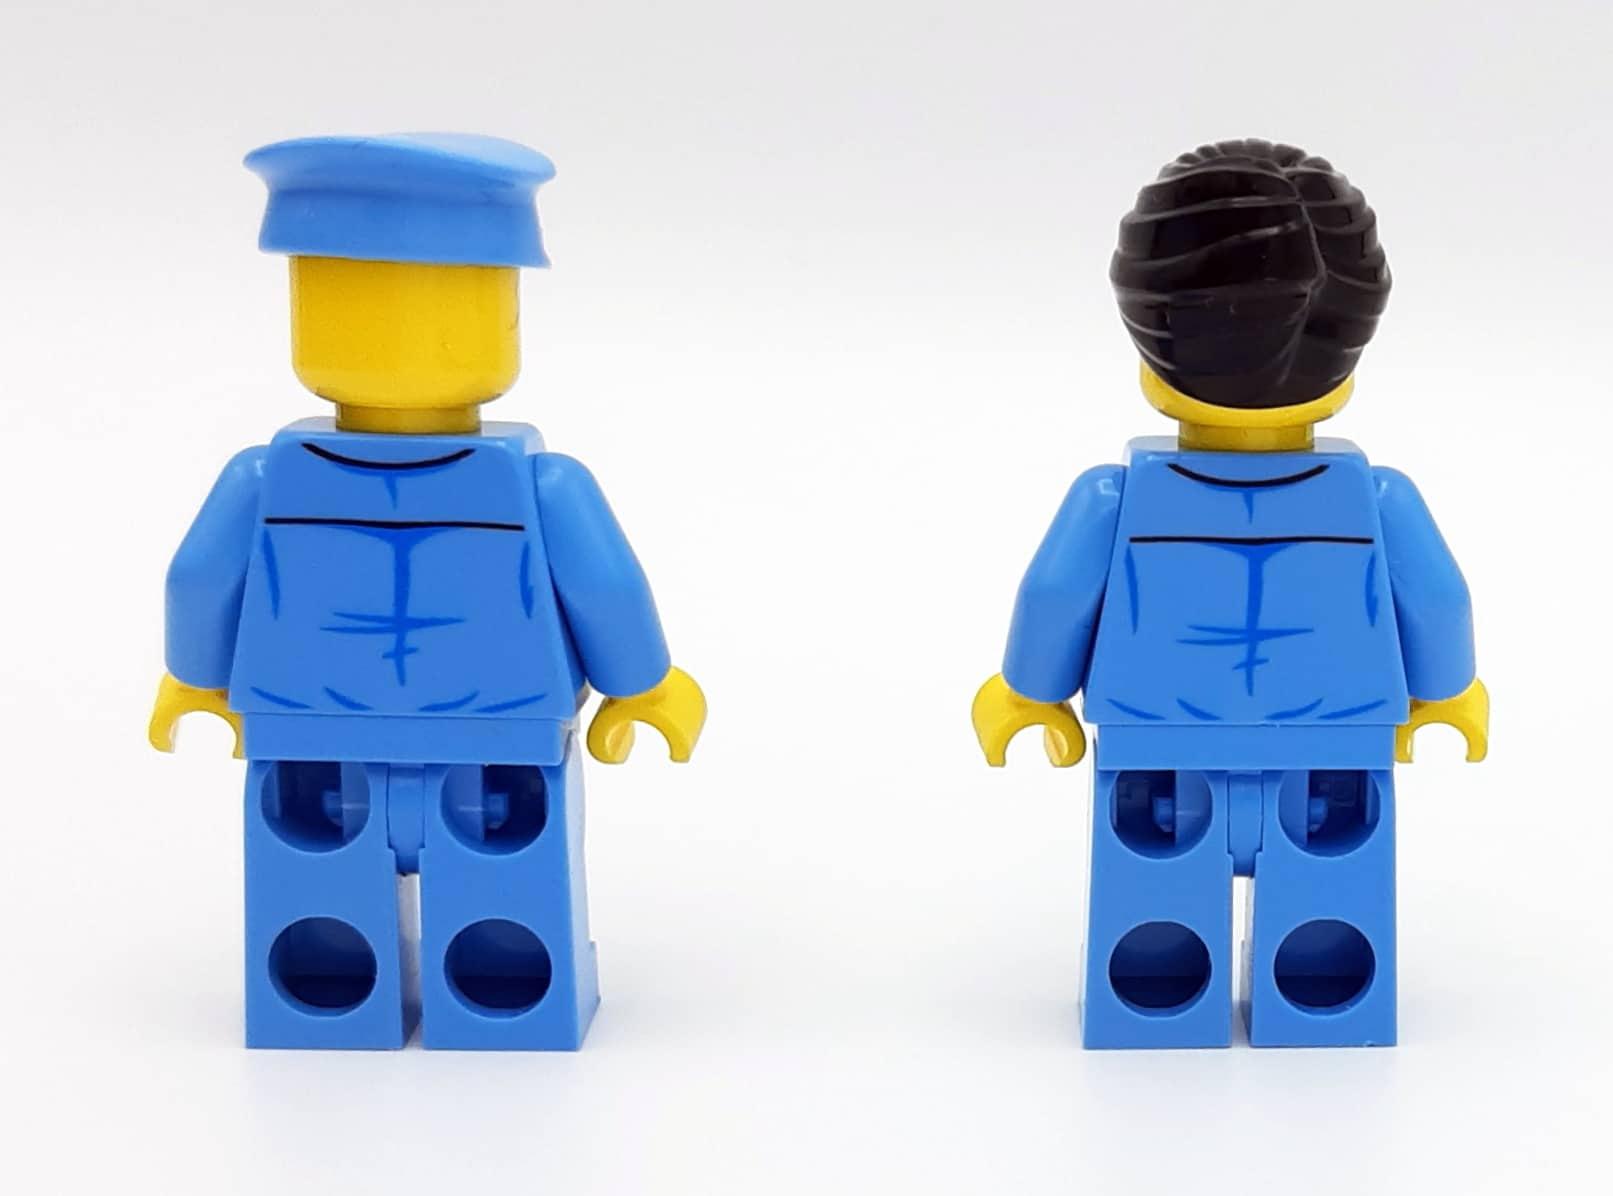 LEGO 10277 Krokodil Lokomotive - Minifiguren von hinten